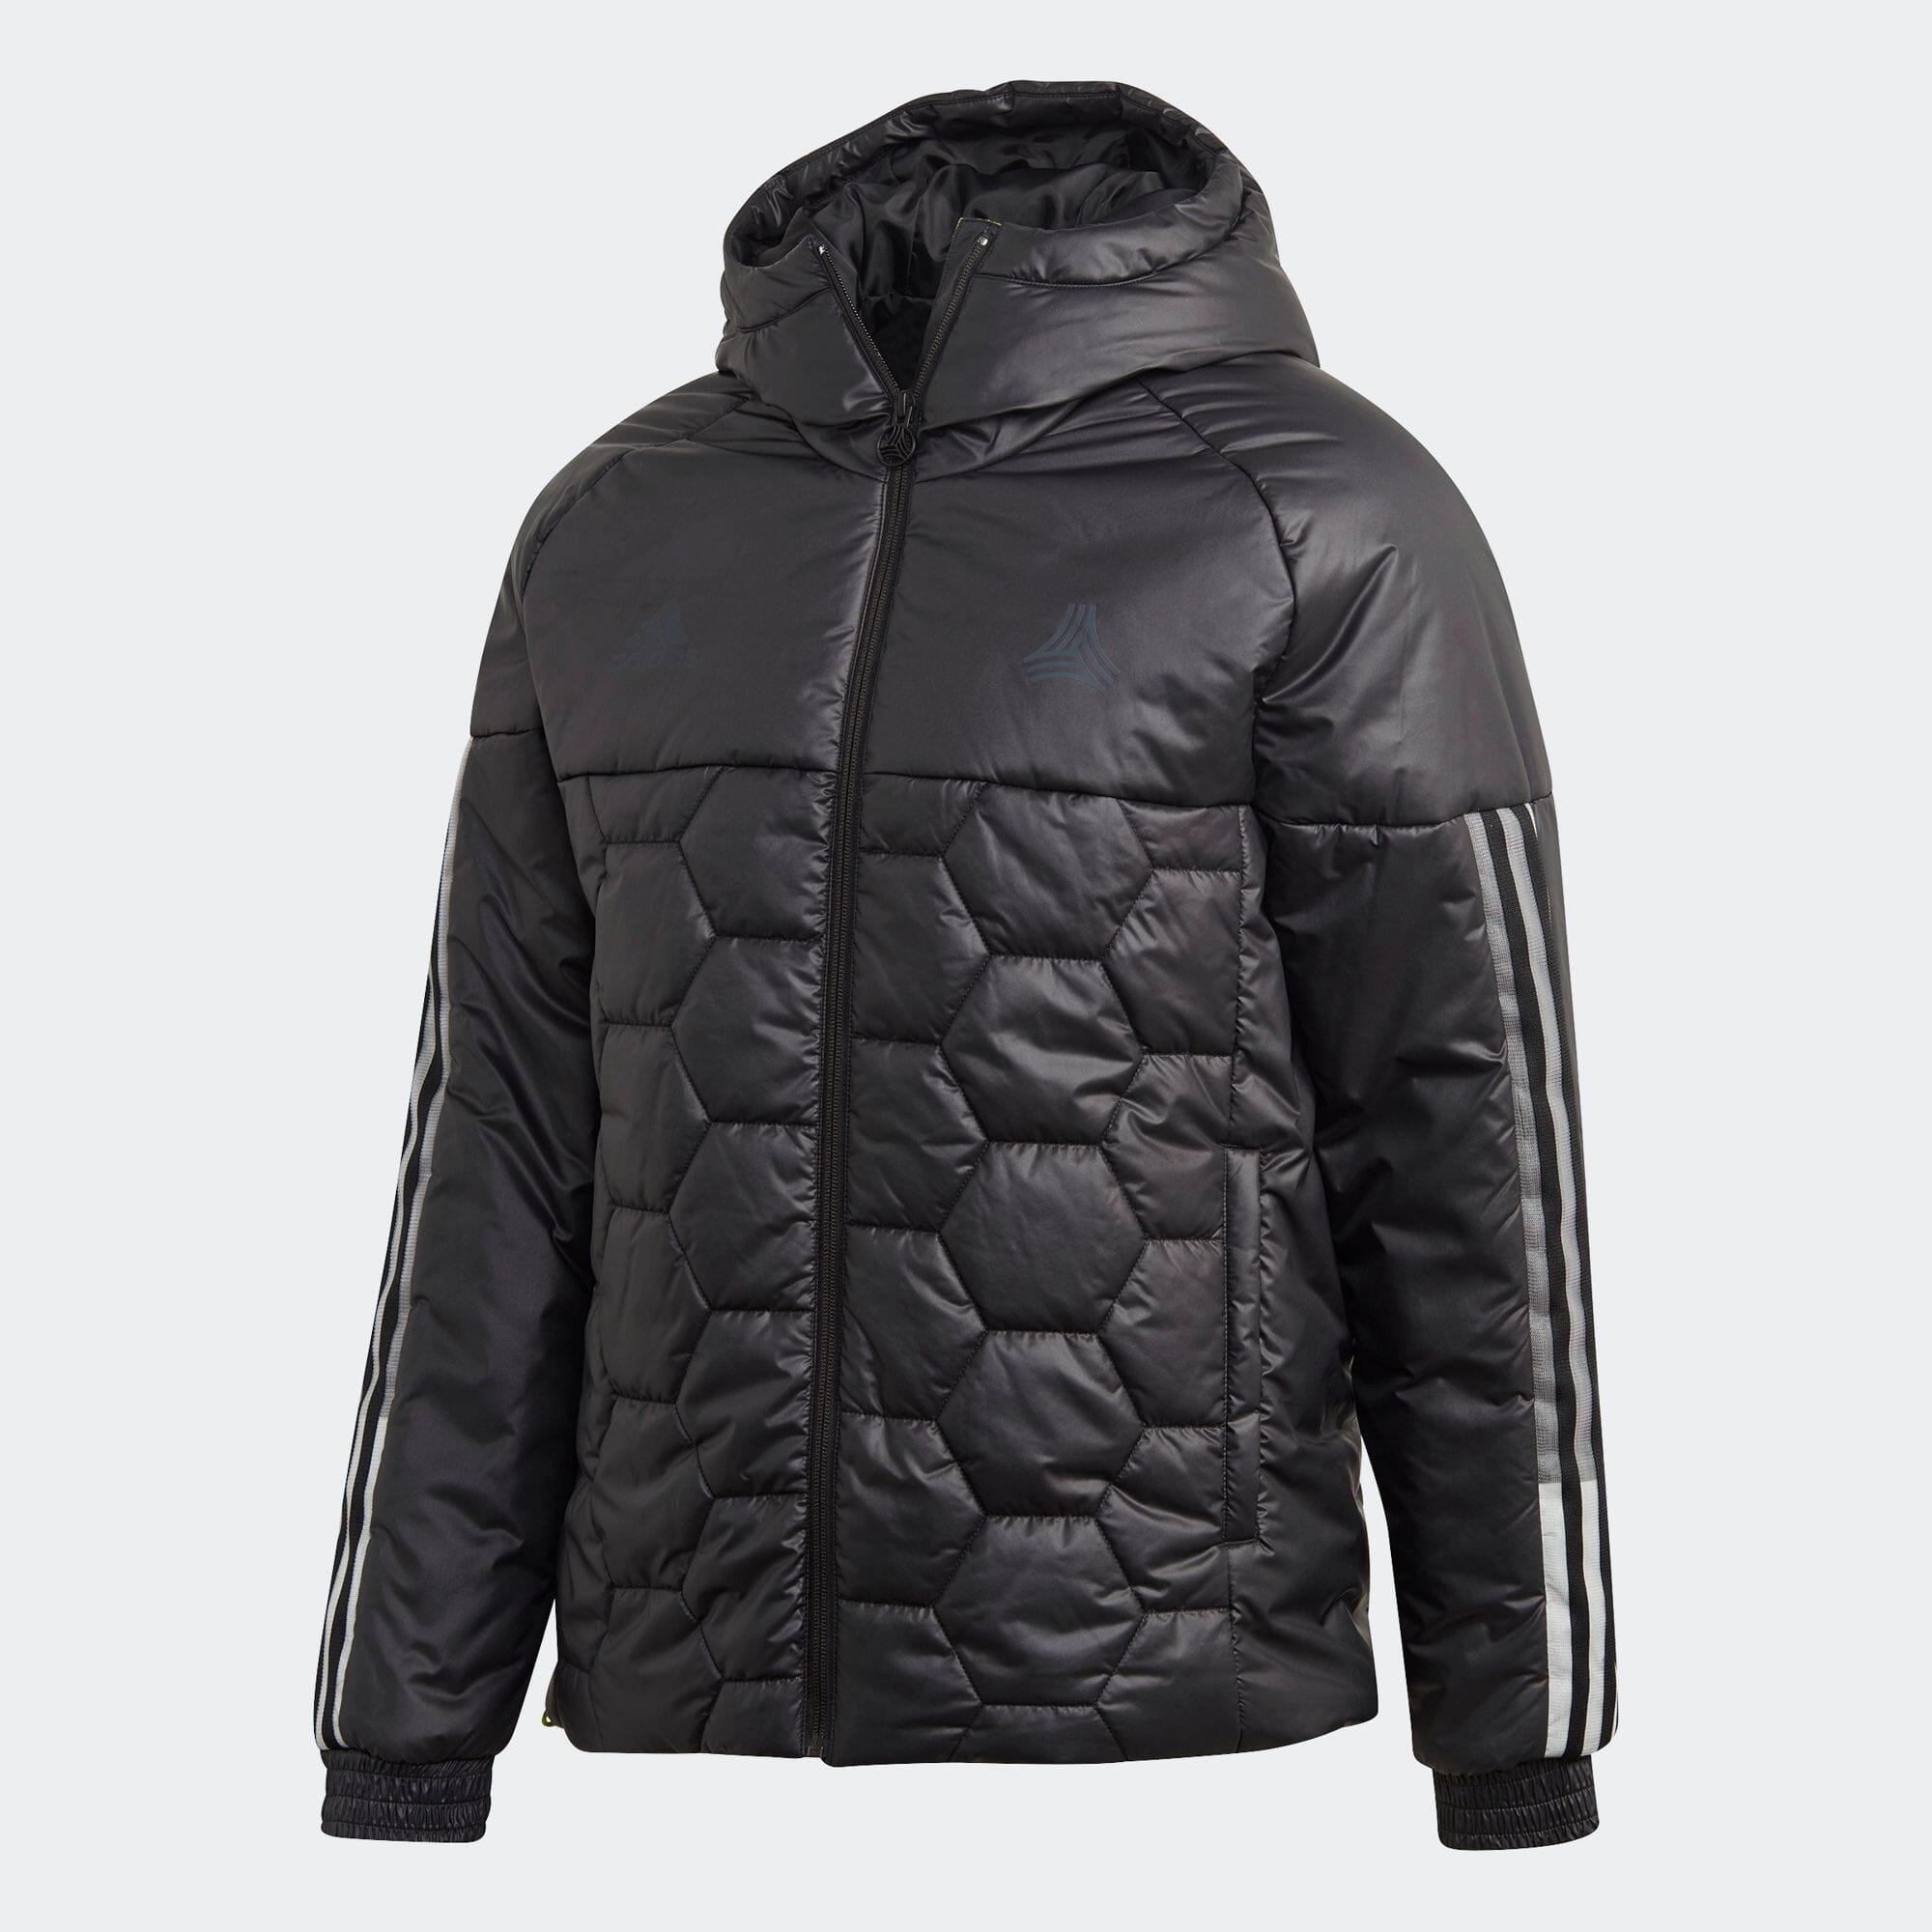 TANGO パデッドジャケット / TANGO Padded Jacket